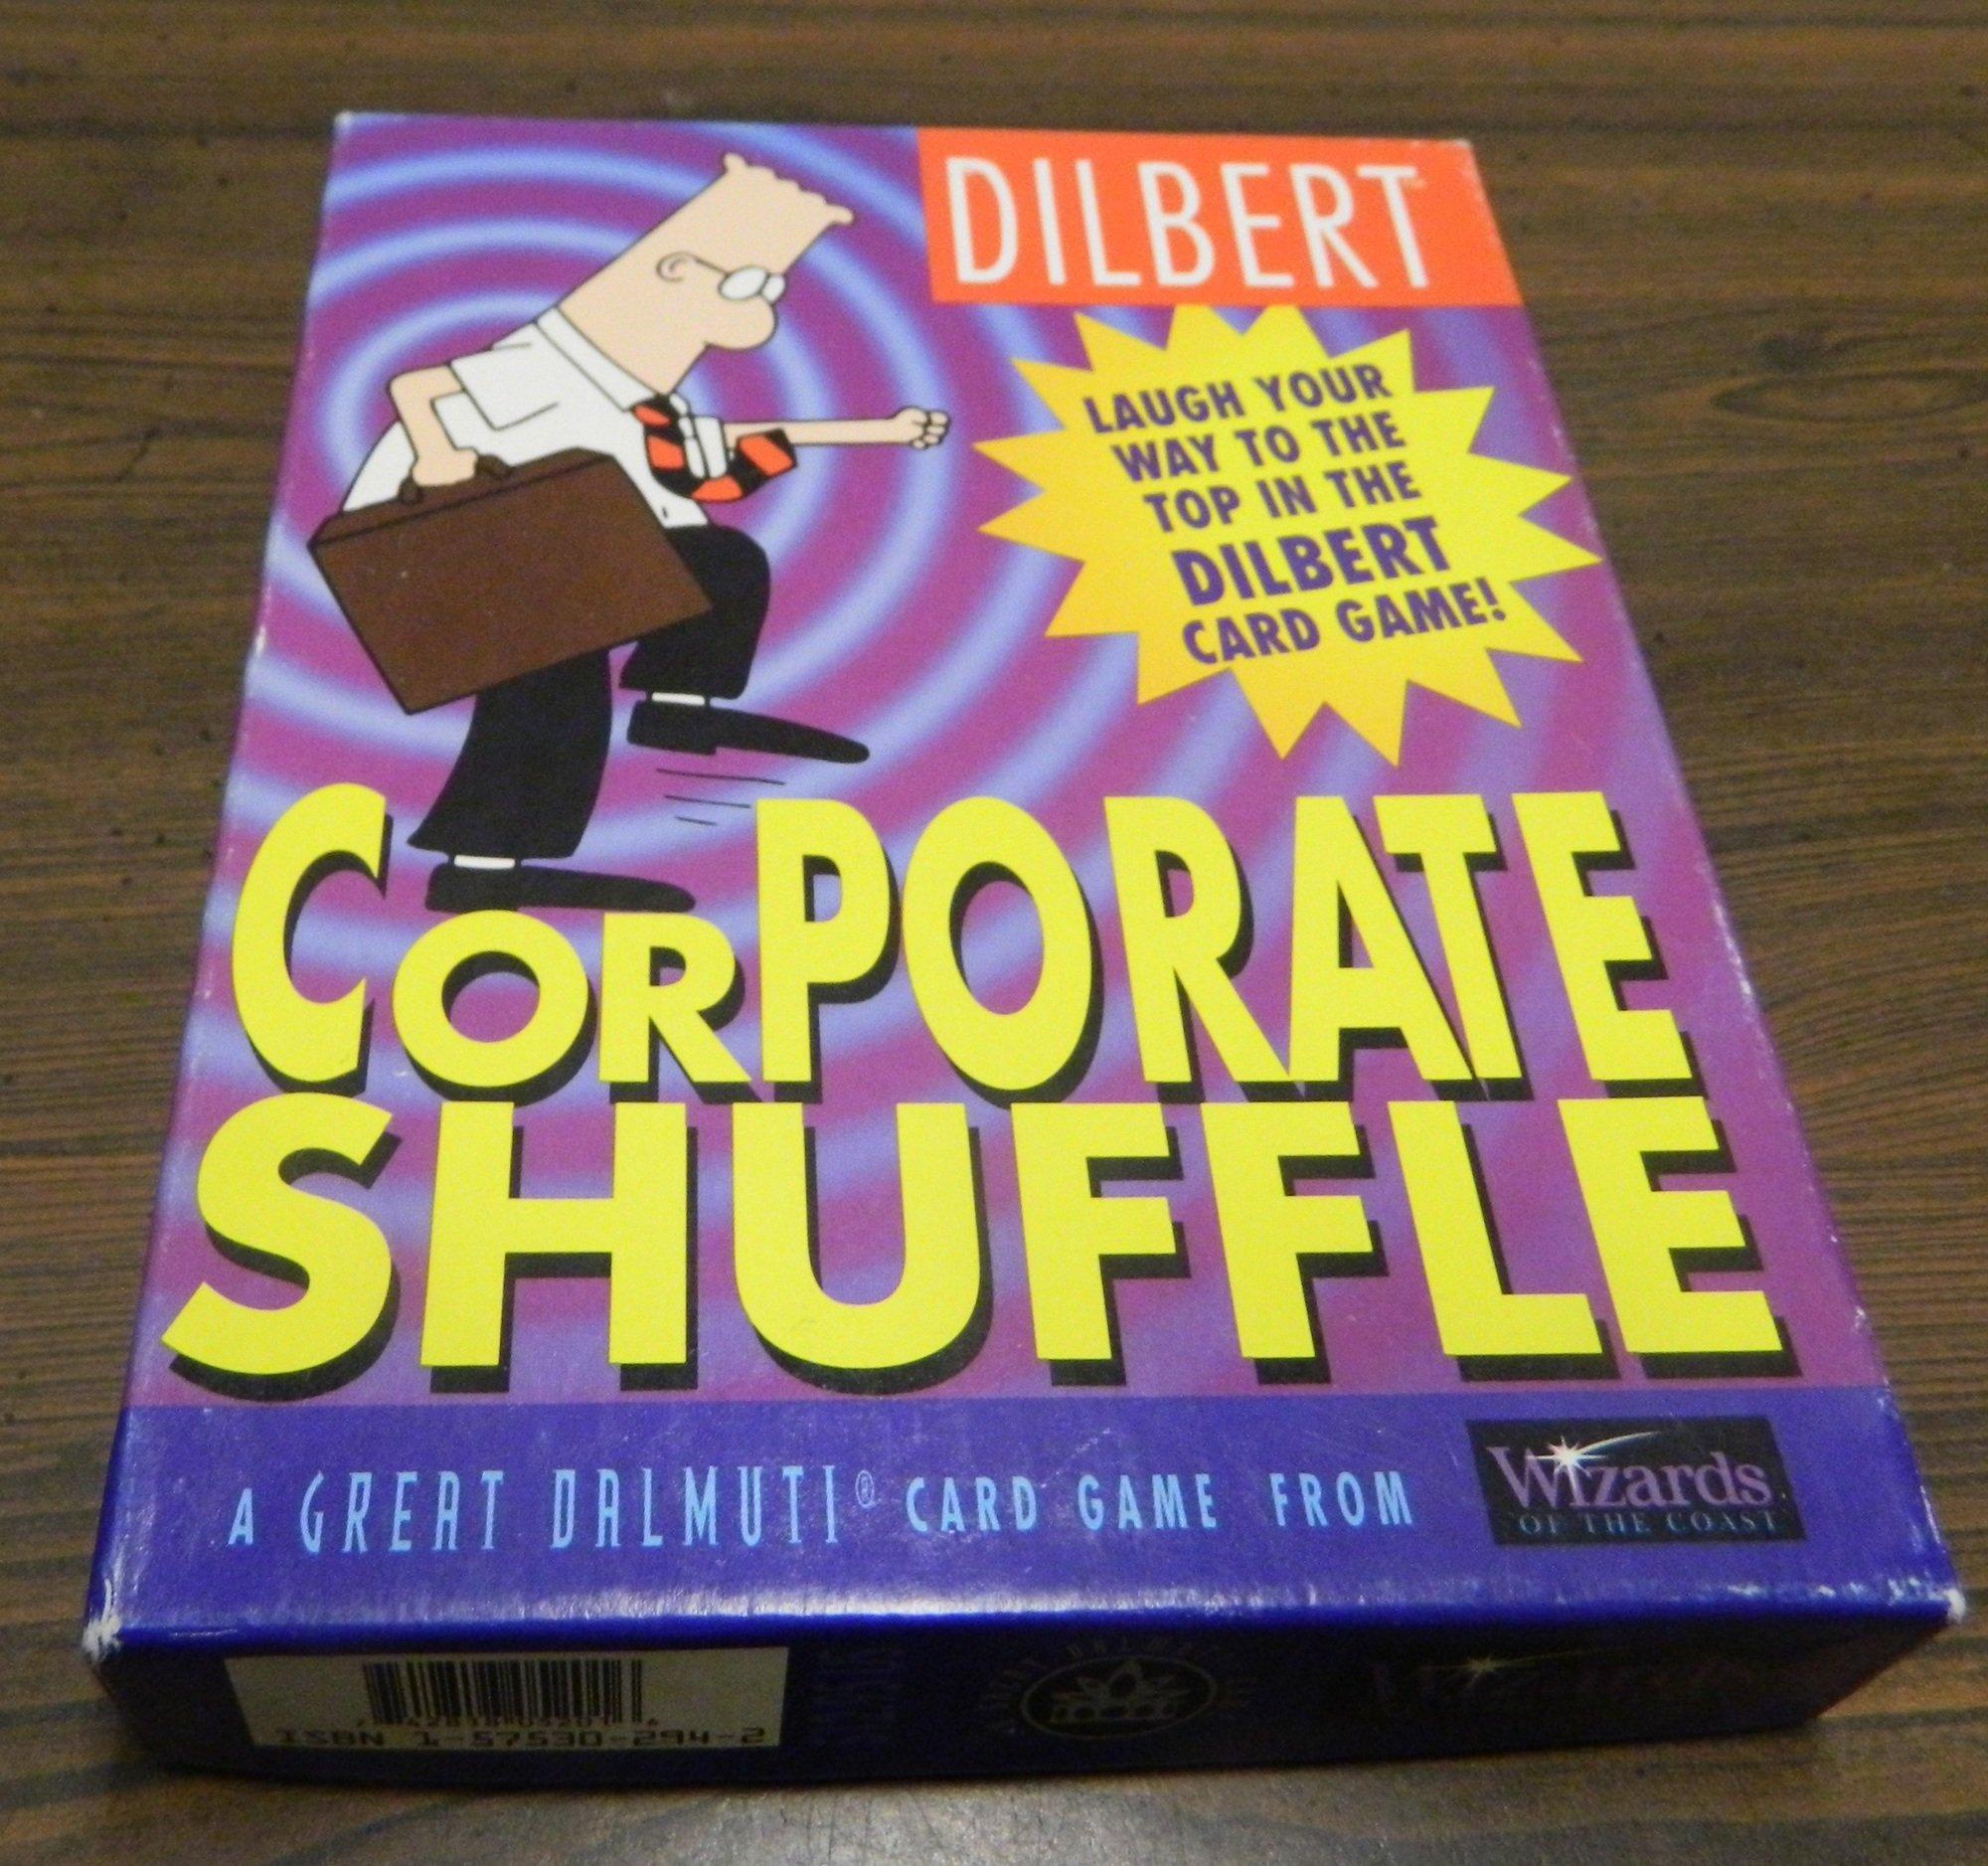 Box for Dilbert Corporate Shuffle